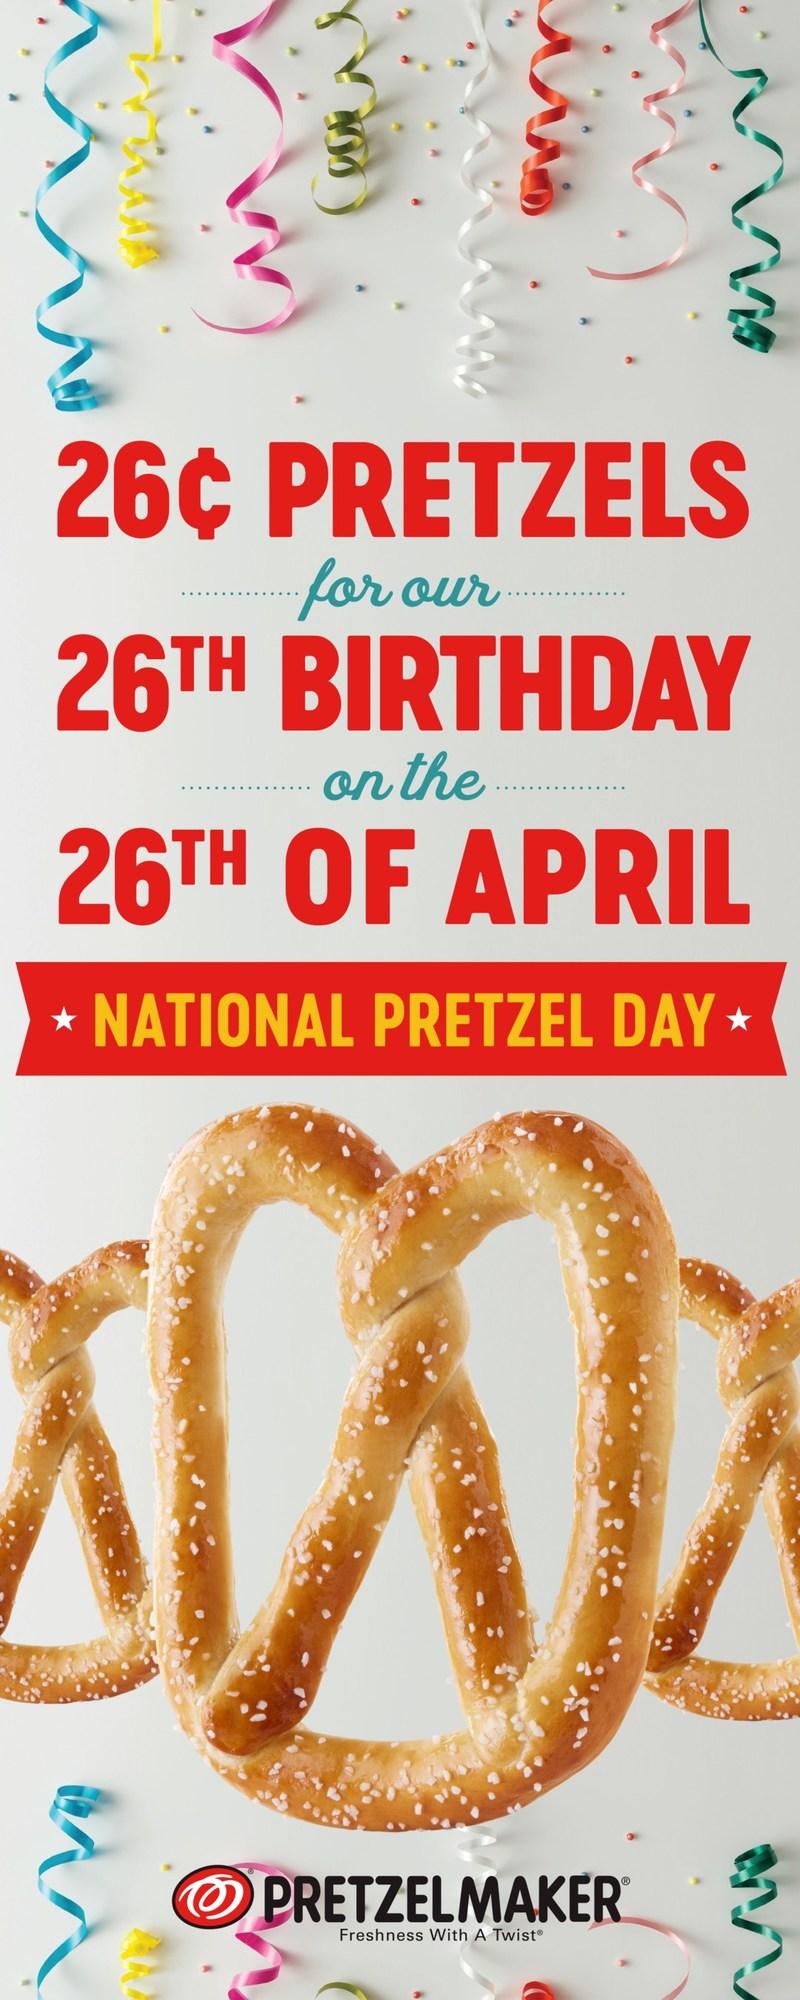 26¢ Pretzels at Pretzelmaker on National Pretzel Day - April 26.